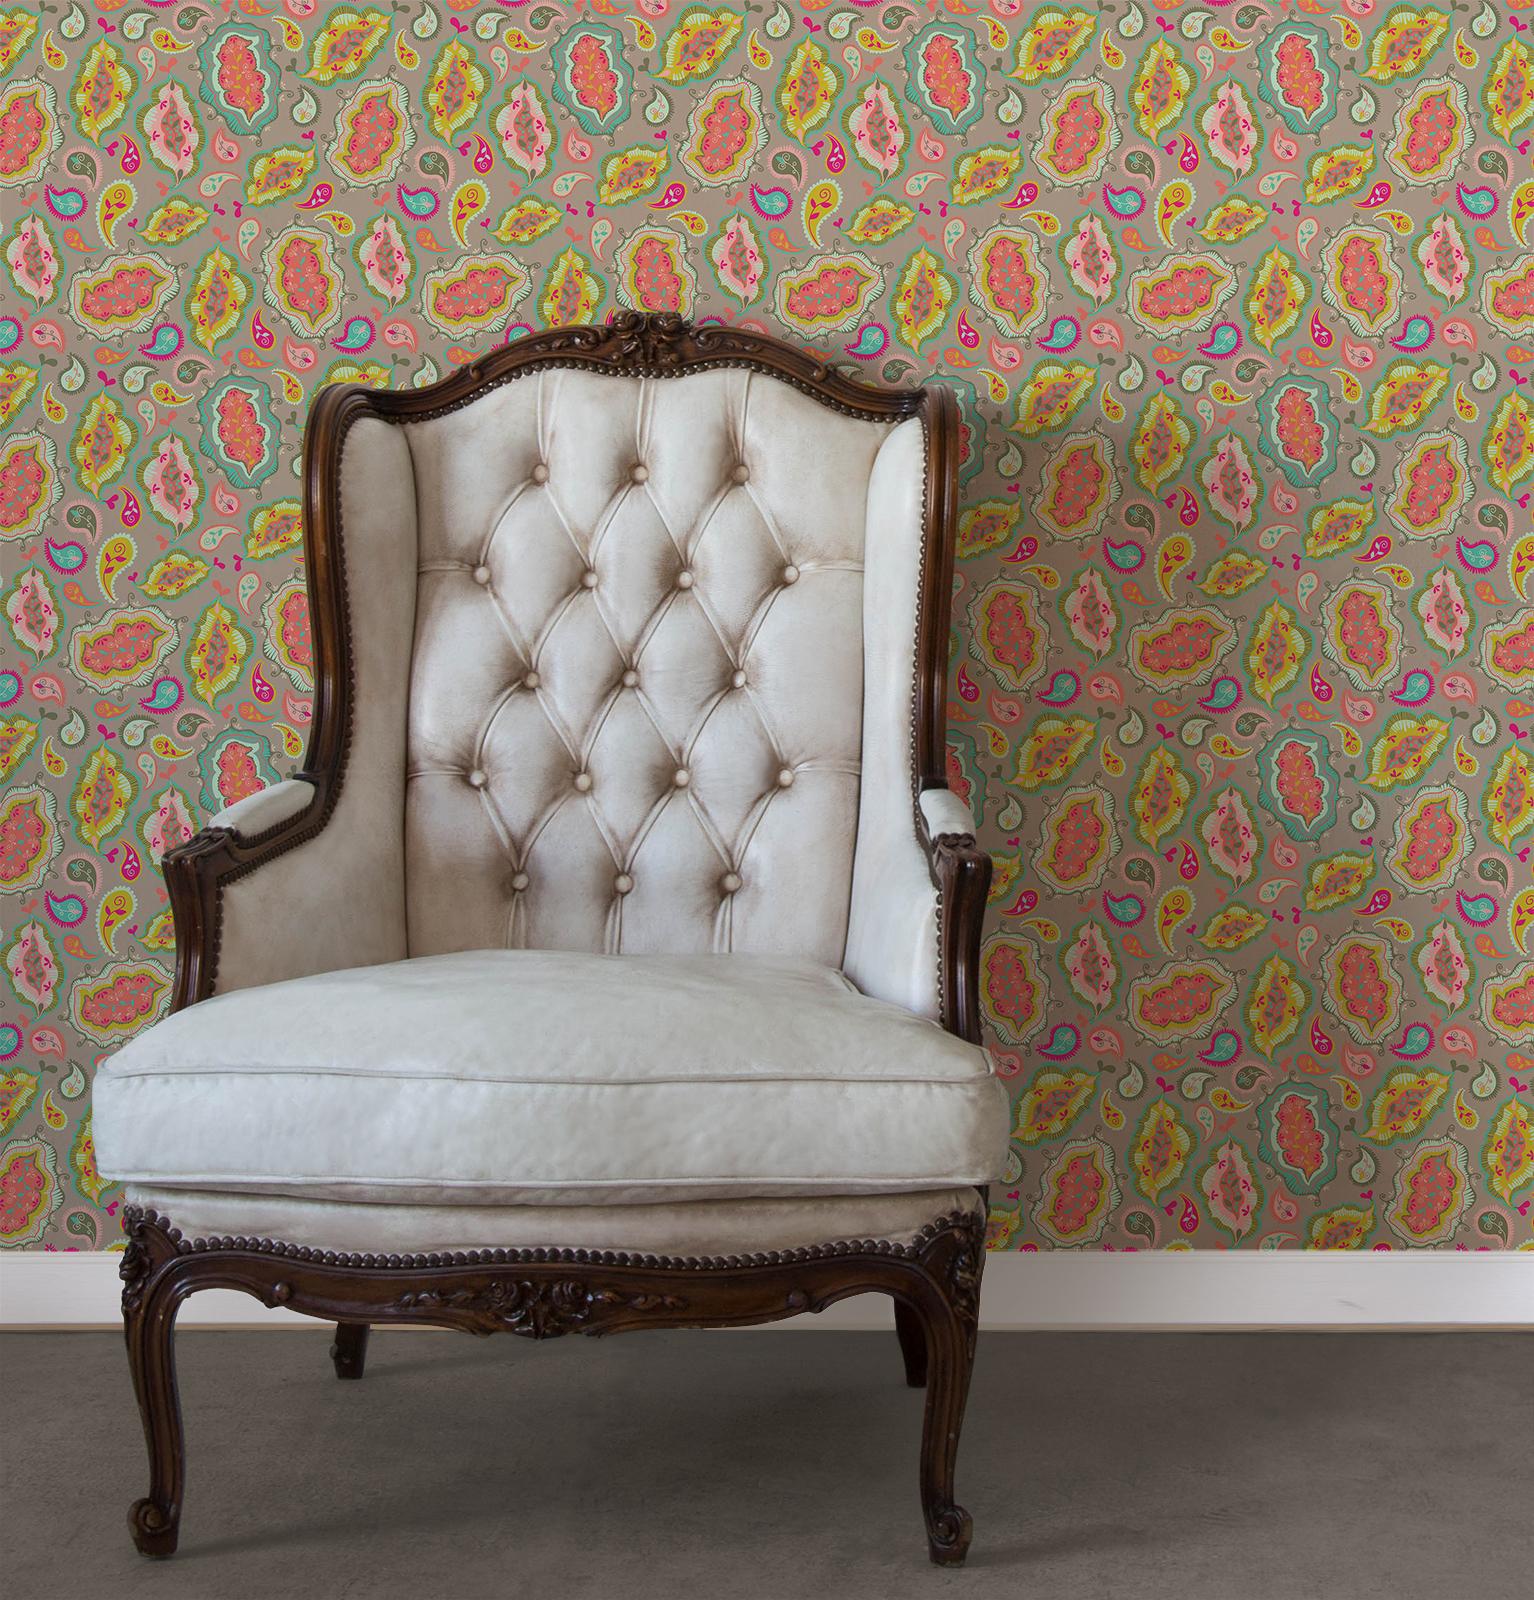 wallpaper tiles diy decor apartment easy budget temporary quick fix 1534x1600